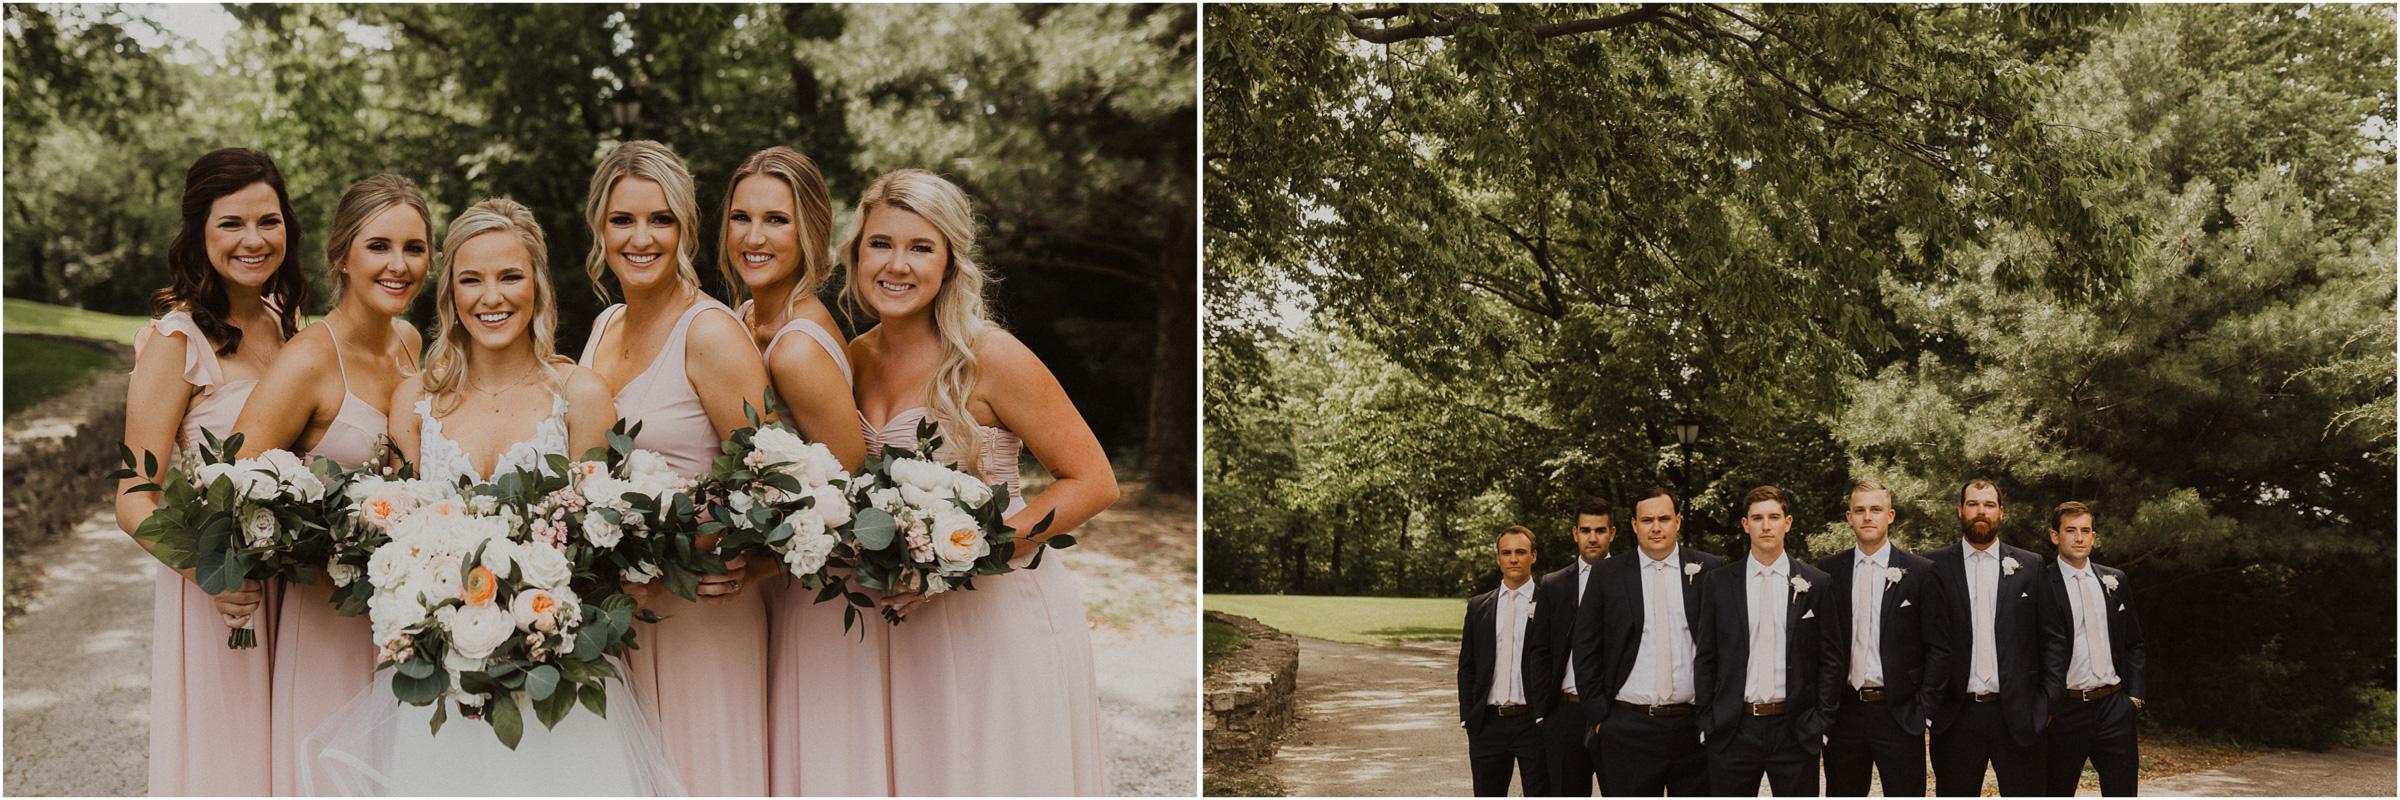 alyssa barletter photography hawthorne house summer outdoor wedding southern charm inspiration-22.jpg